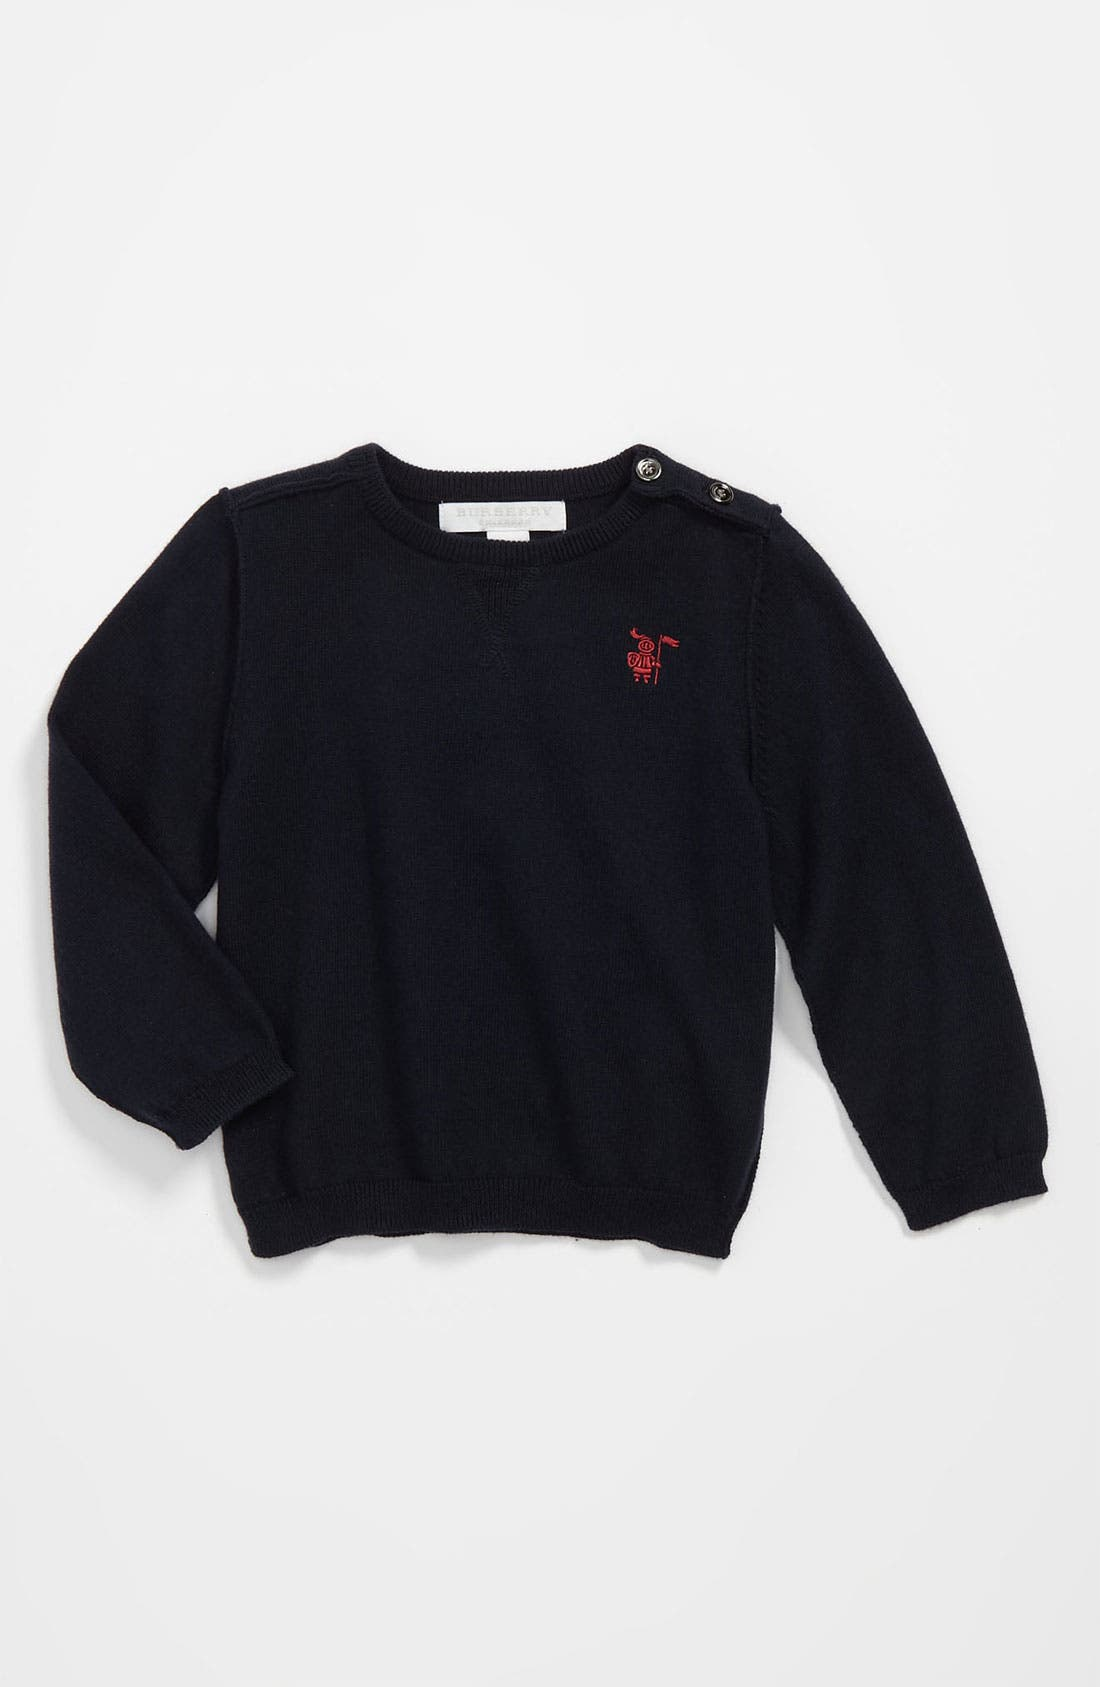 Main Image - Burberry 'Mini Kane' Sweater (Baby)